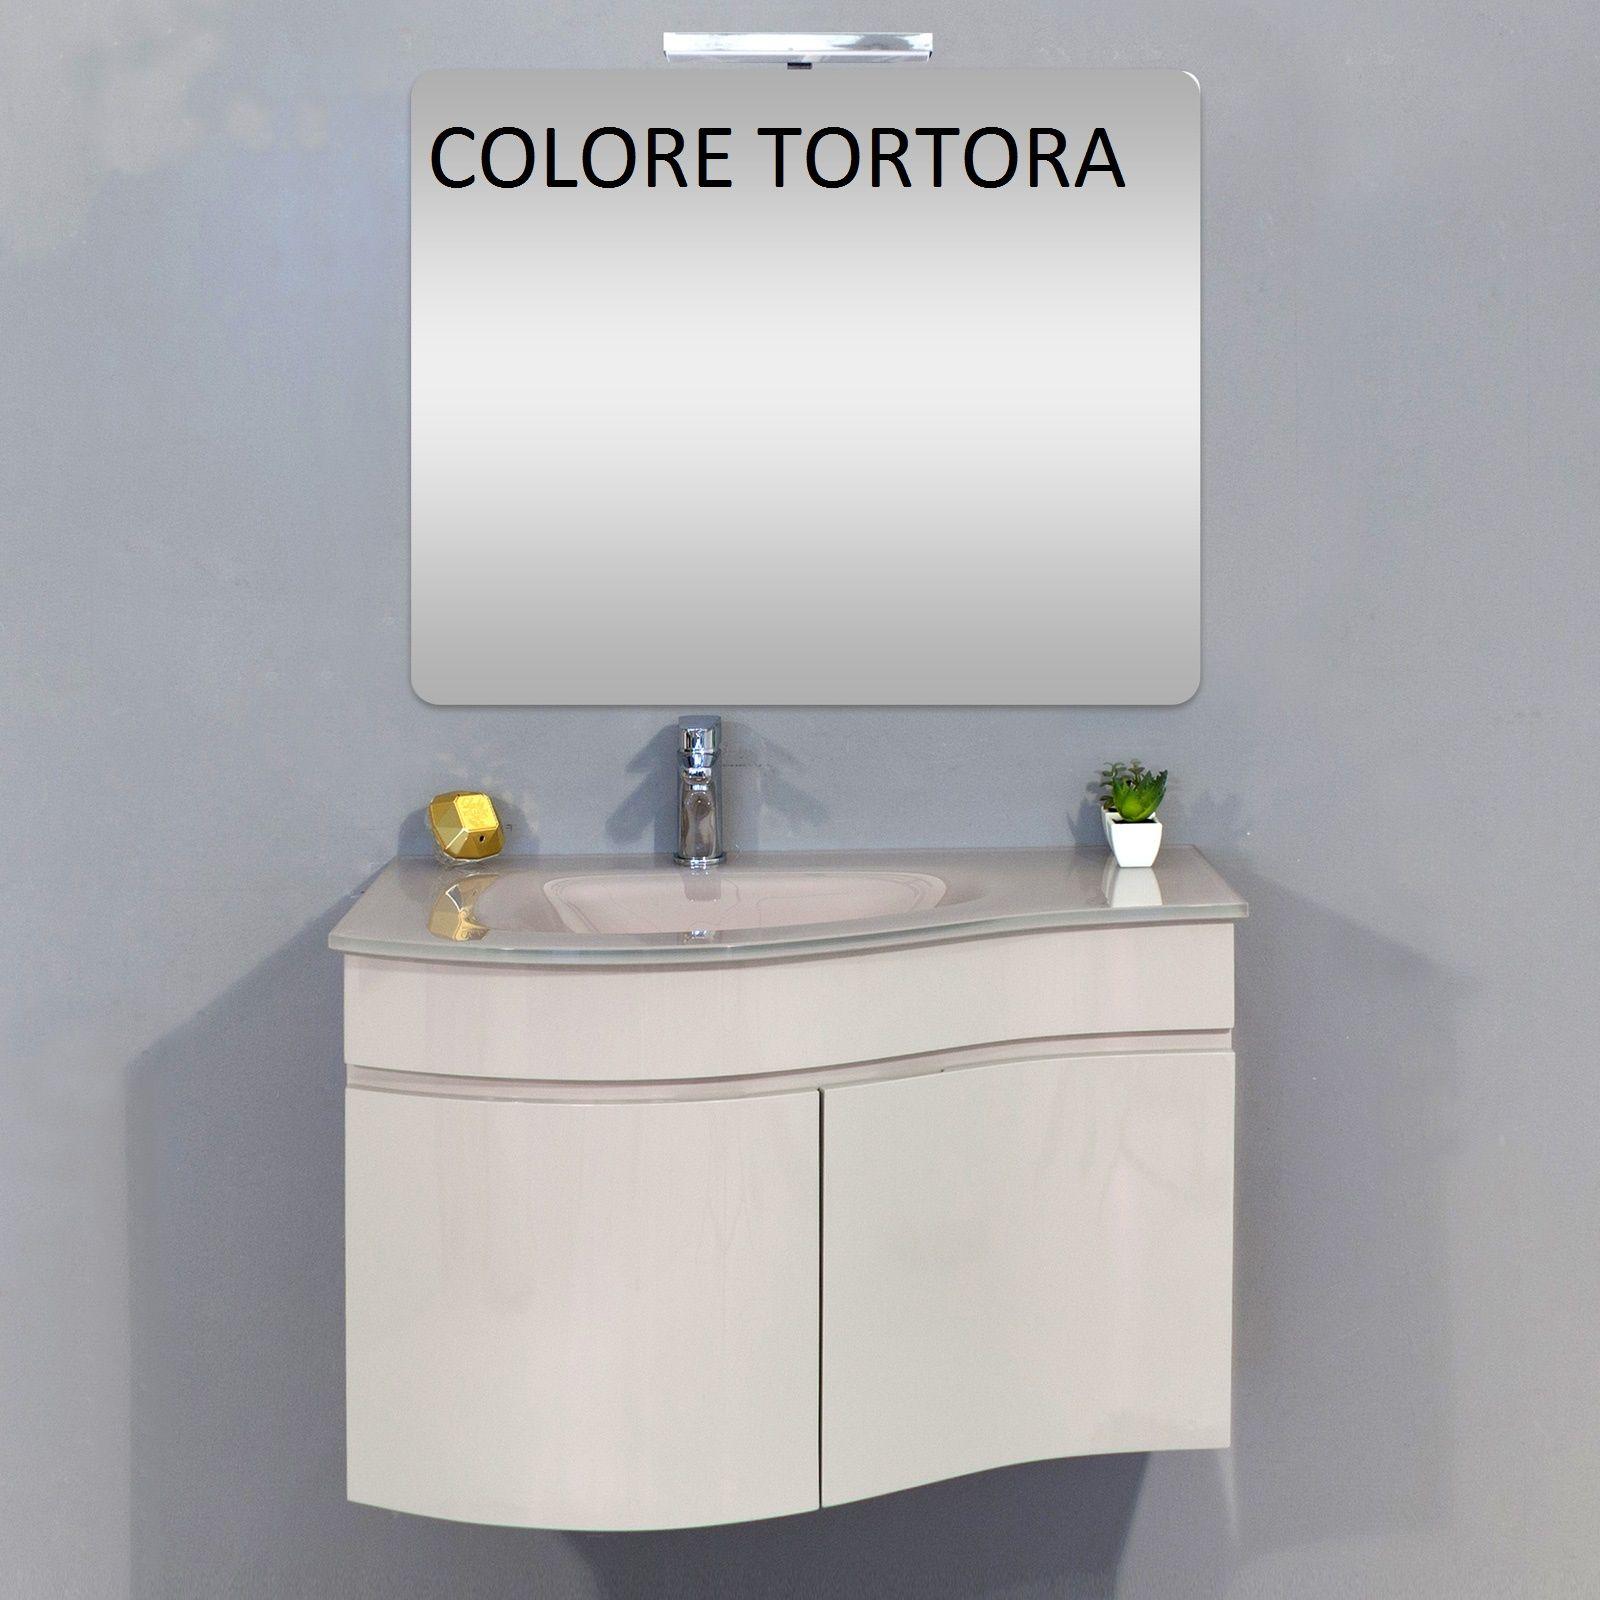 MOBILE ARREDO BAGNO 80 o 100 cm BIANCO O TORTORA LAVABO IN CRISTALLO MODERNO 62  eBay